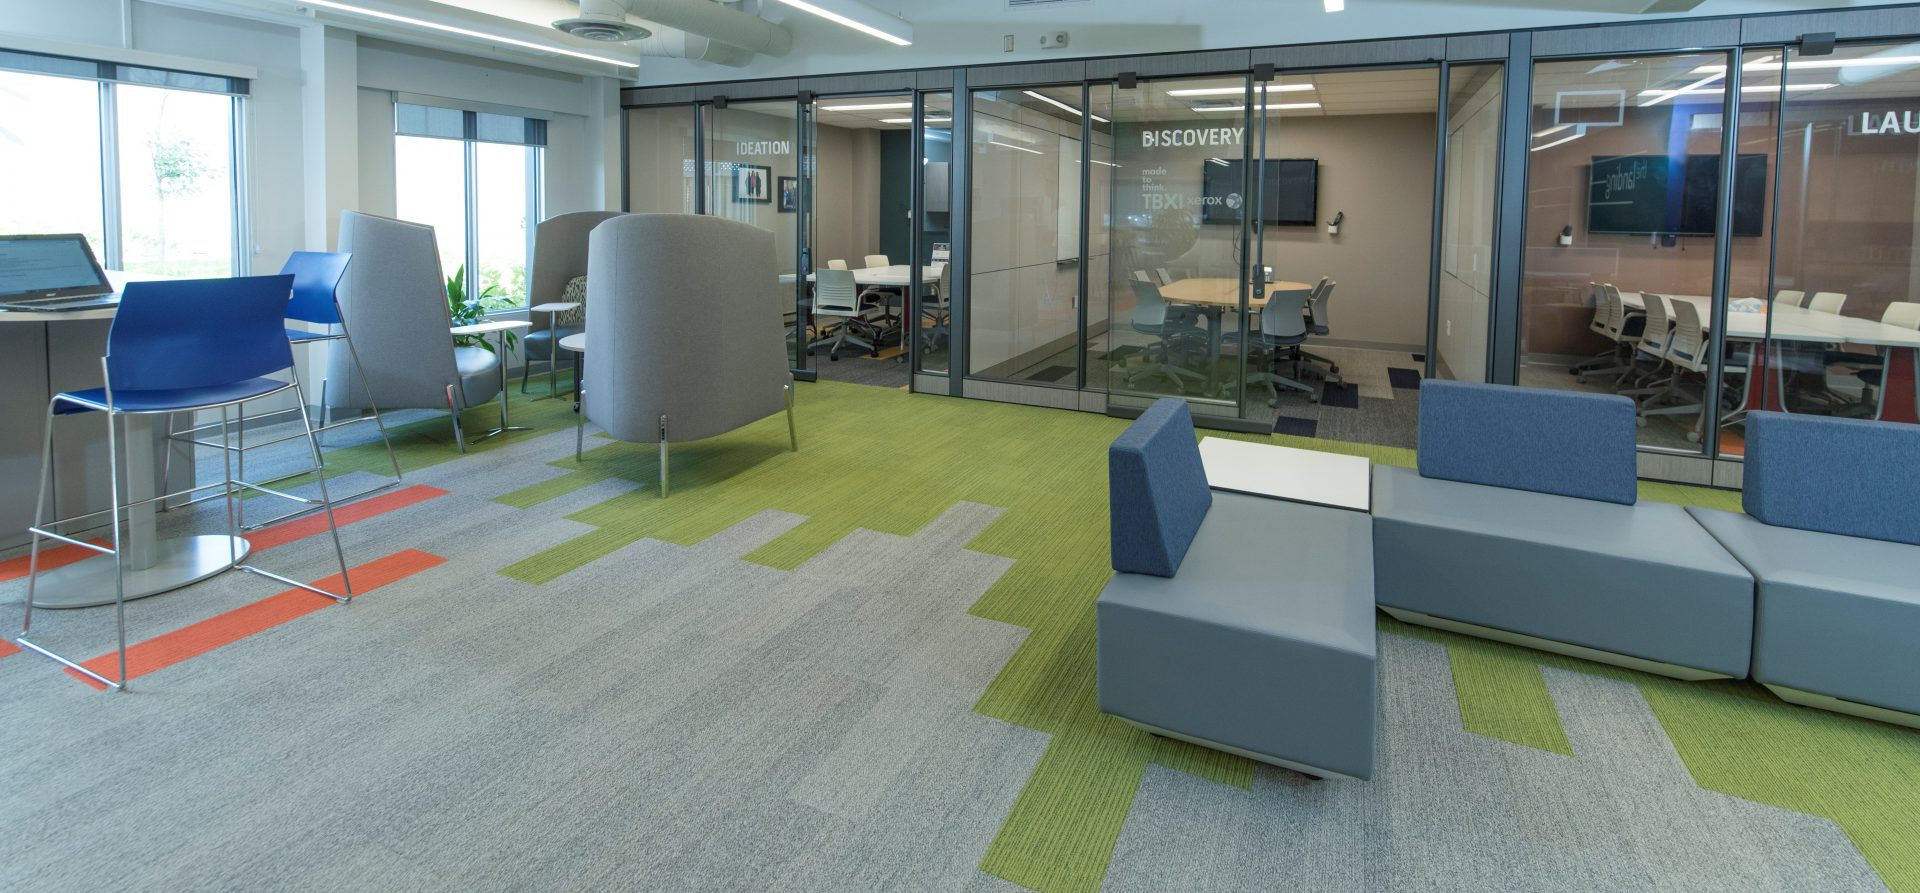 Interface carpet tile install at NWO Innovation centre